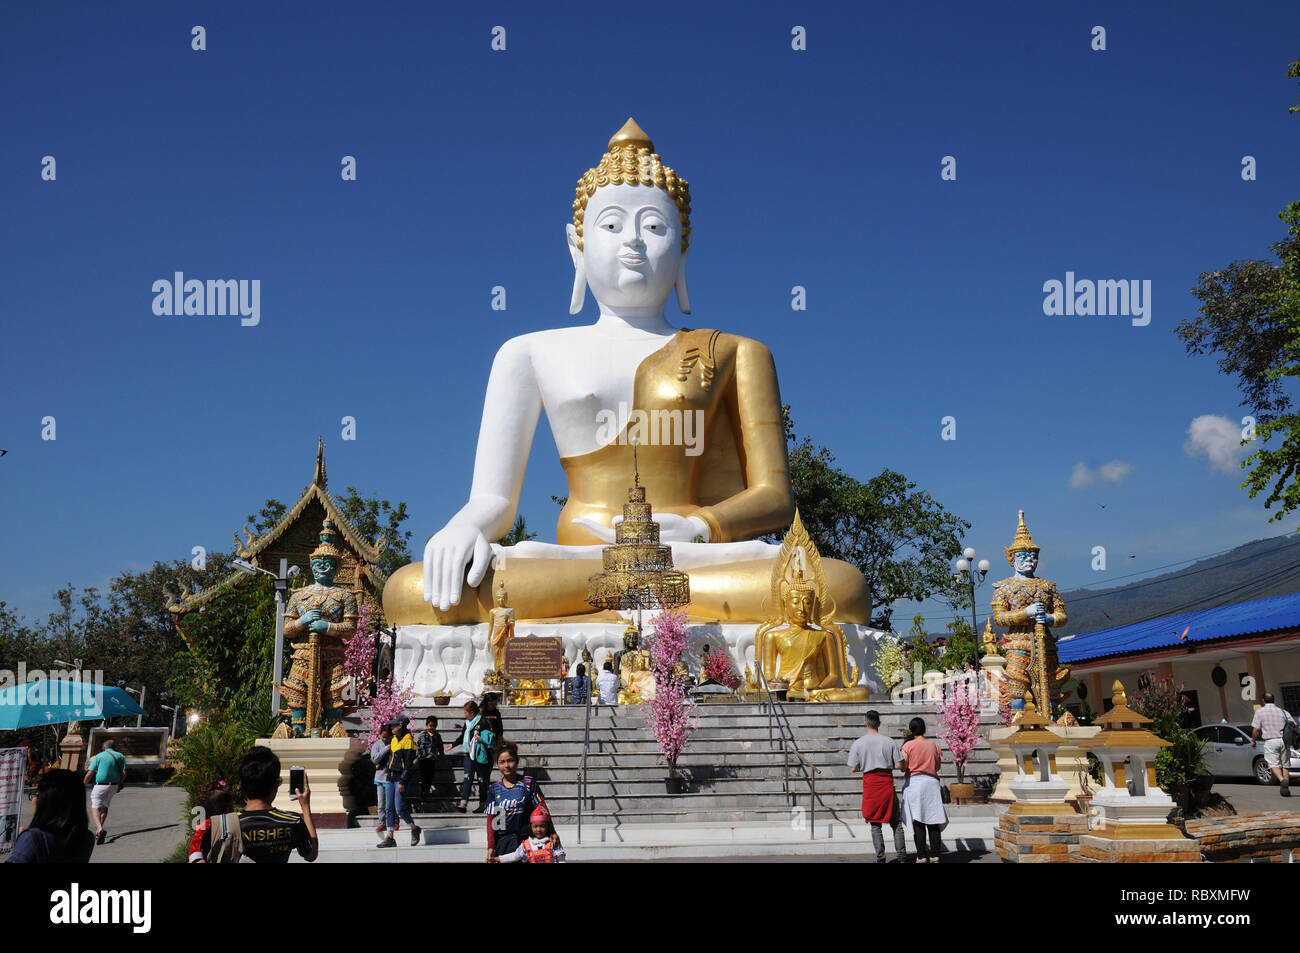 Giant statue of seated Buddha at Wat Phra That Doi Kham, Chiang Mai, Thailand Stock Photo